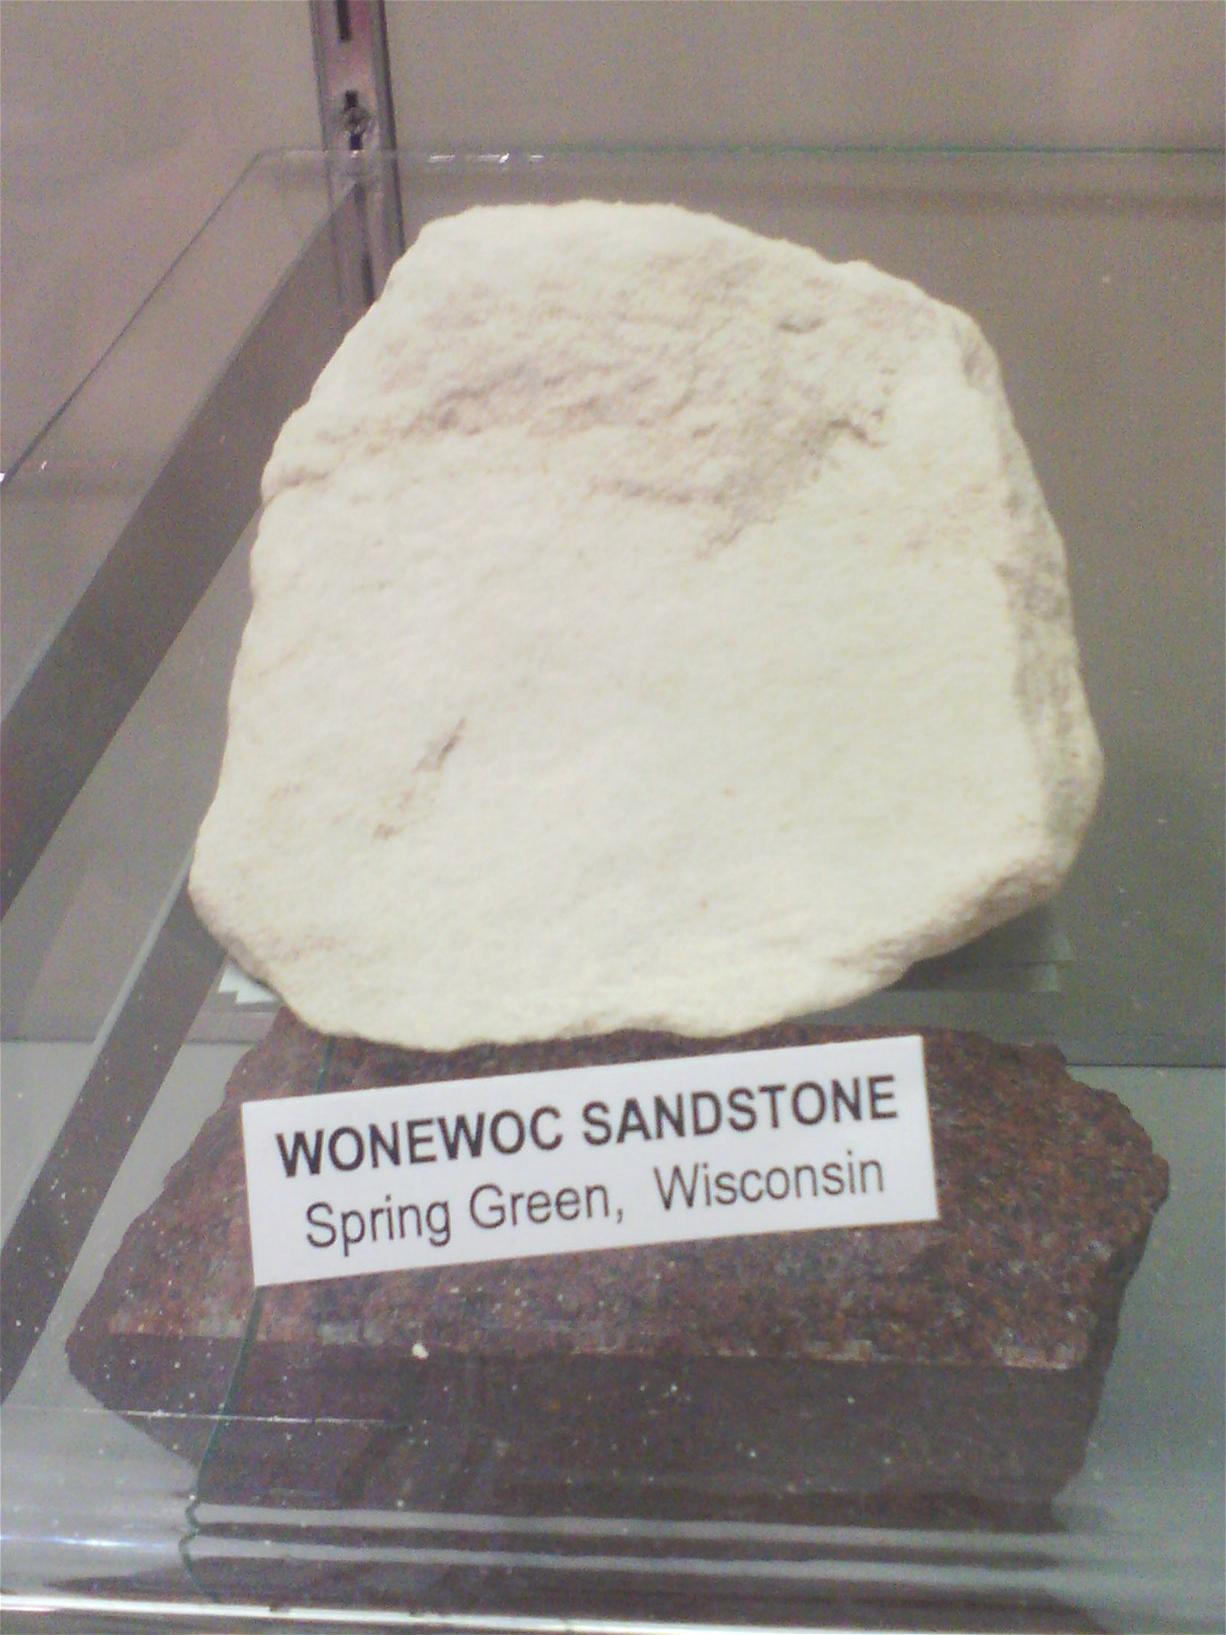 A sample piece of wonewoc sandstone found in Spring Green, Wisconsin